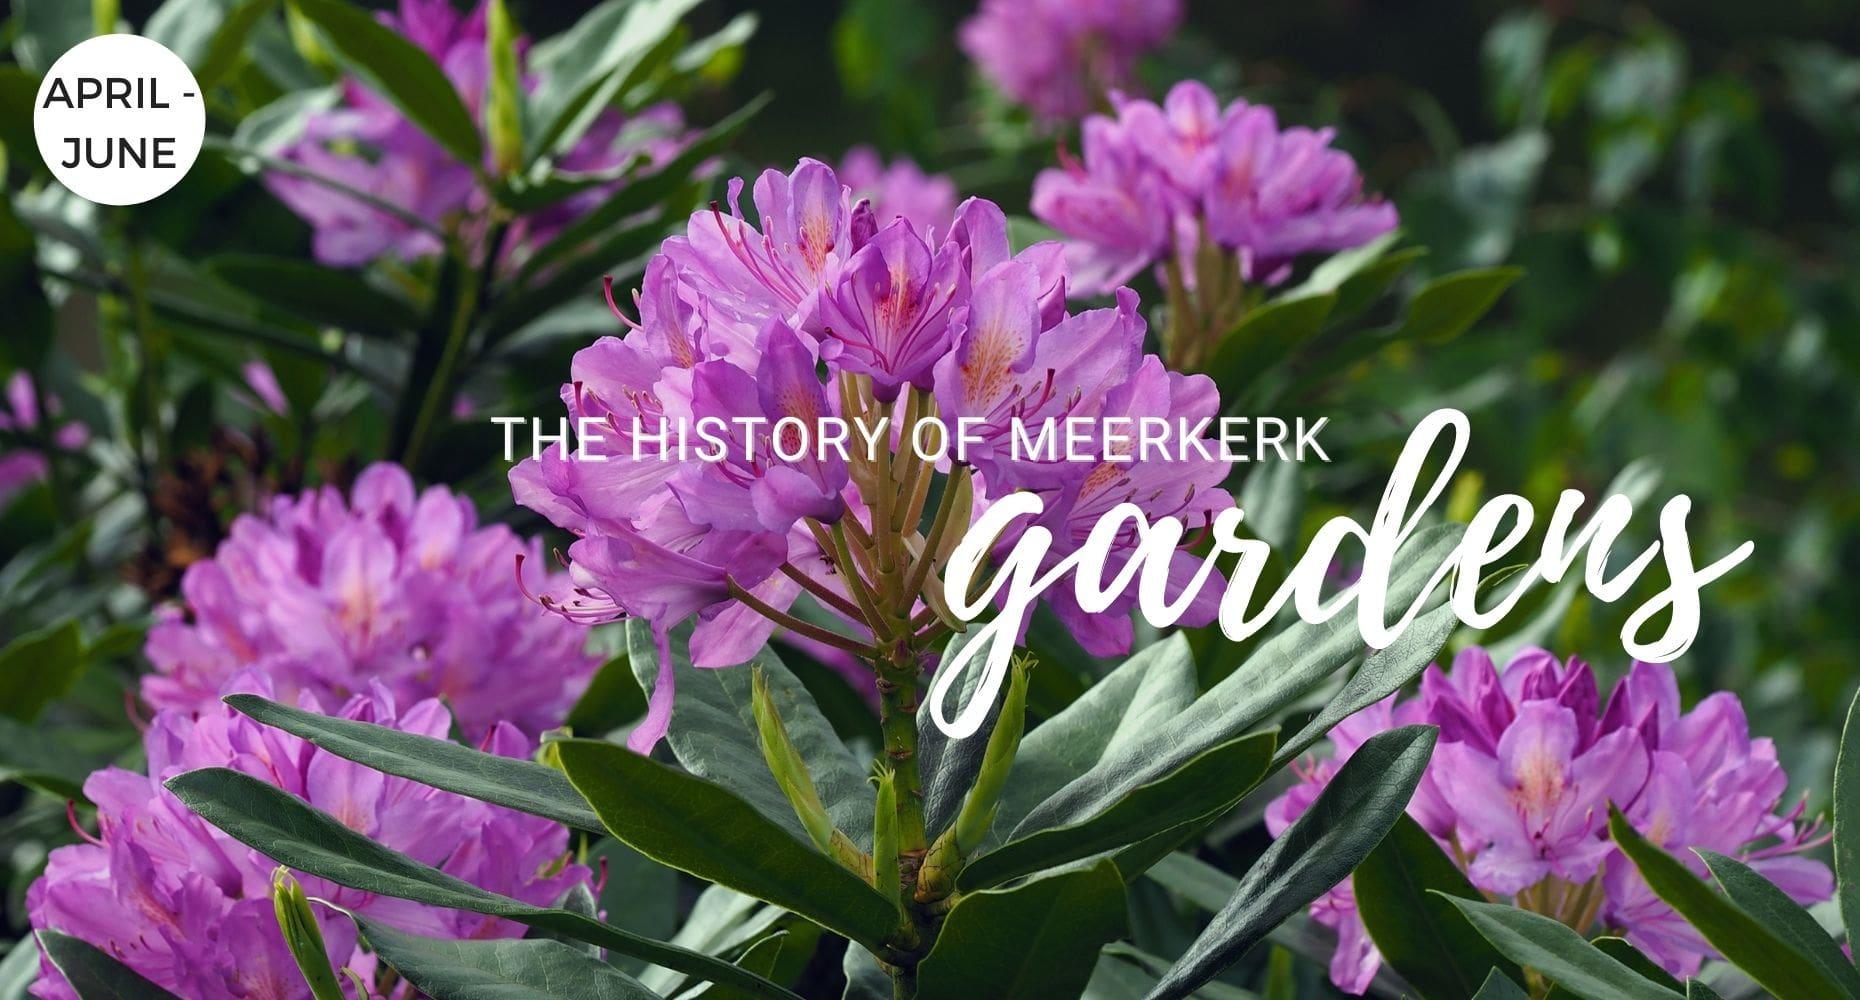 The History of Meerkerk Gardens